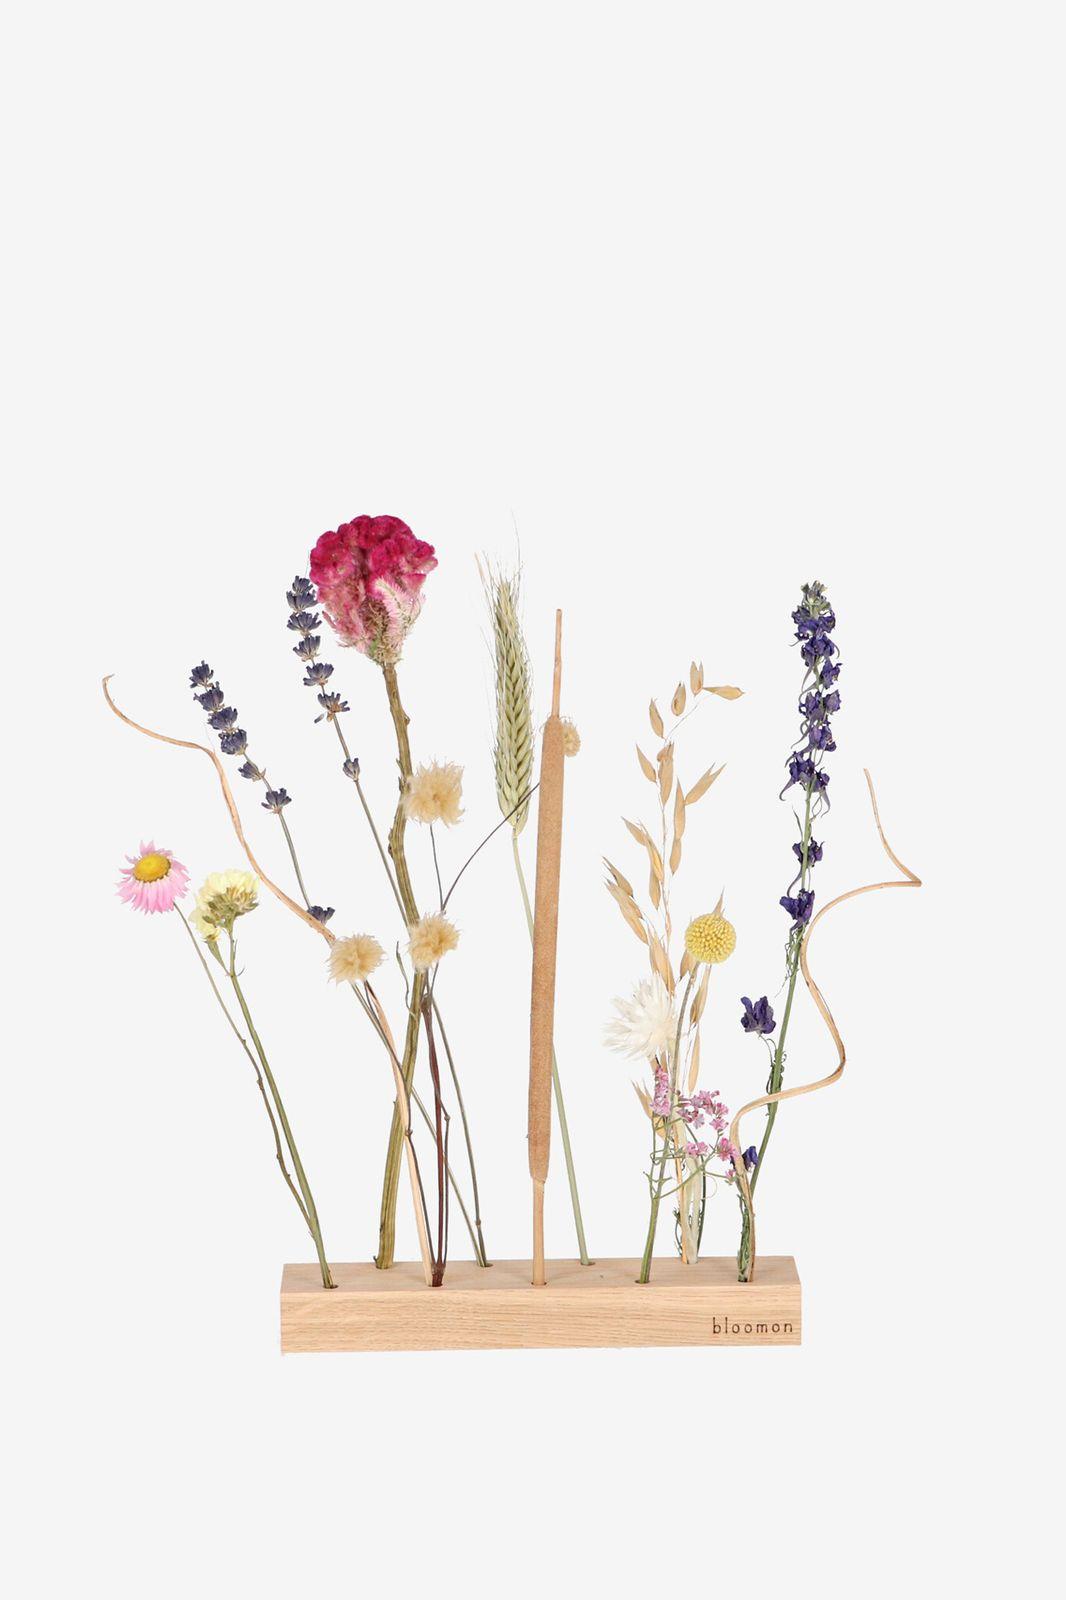 Bloomon droogbloemen picnic - Homeland   Sissy-Boy